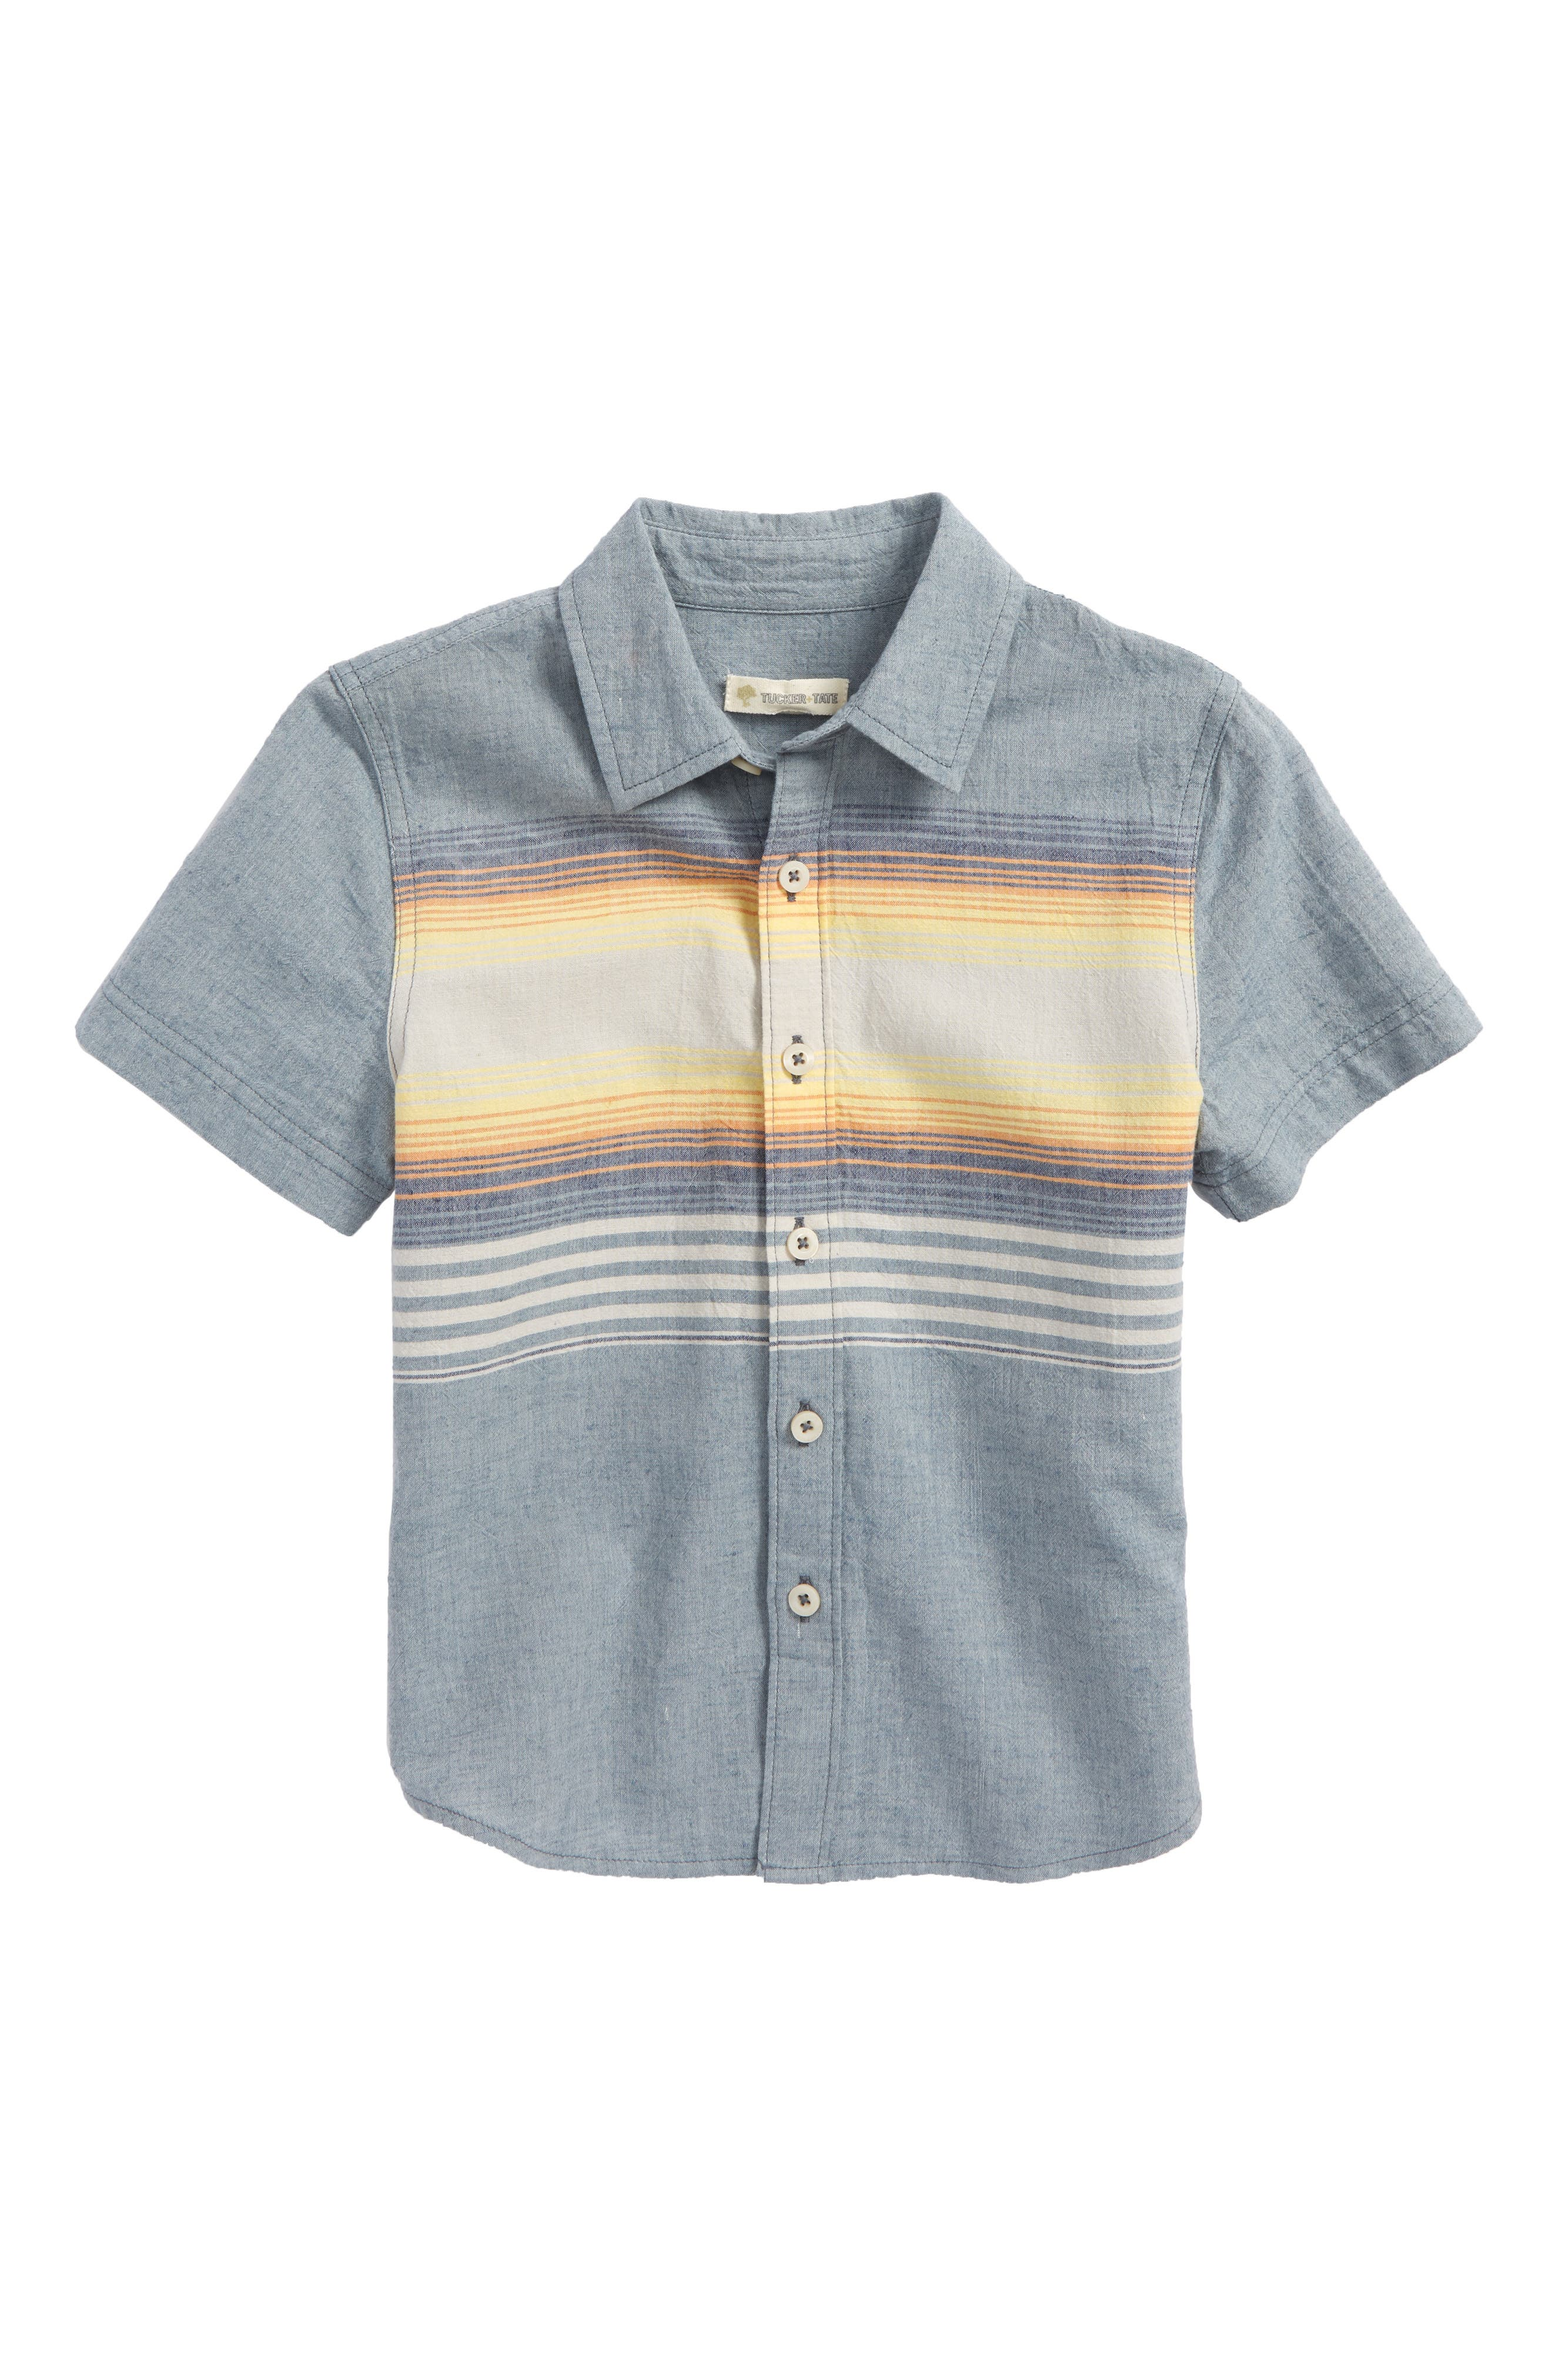 Chambray Stripe Shirt,                         Main,                         color, Blue Chambray Sunset Stripe